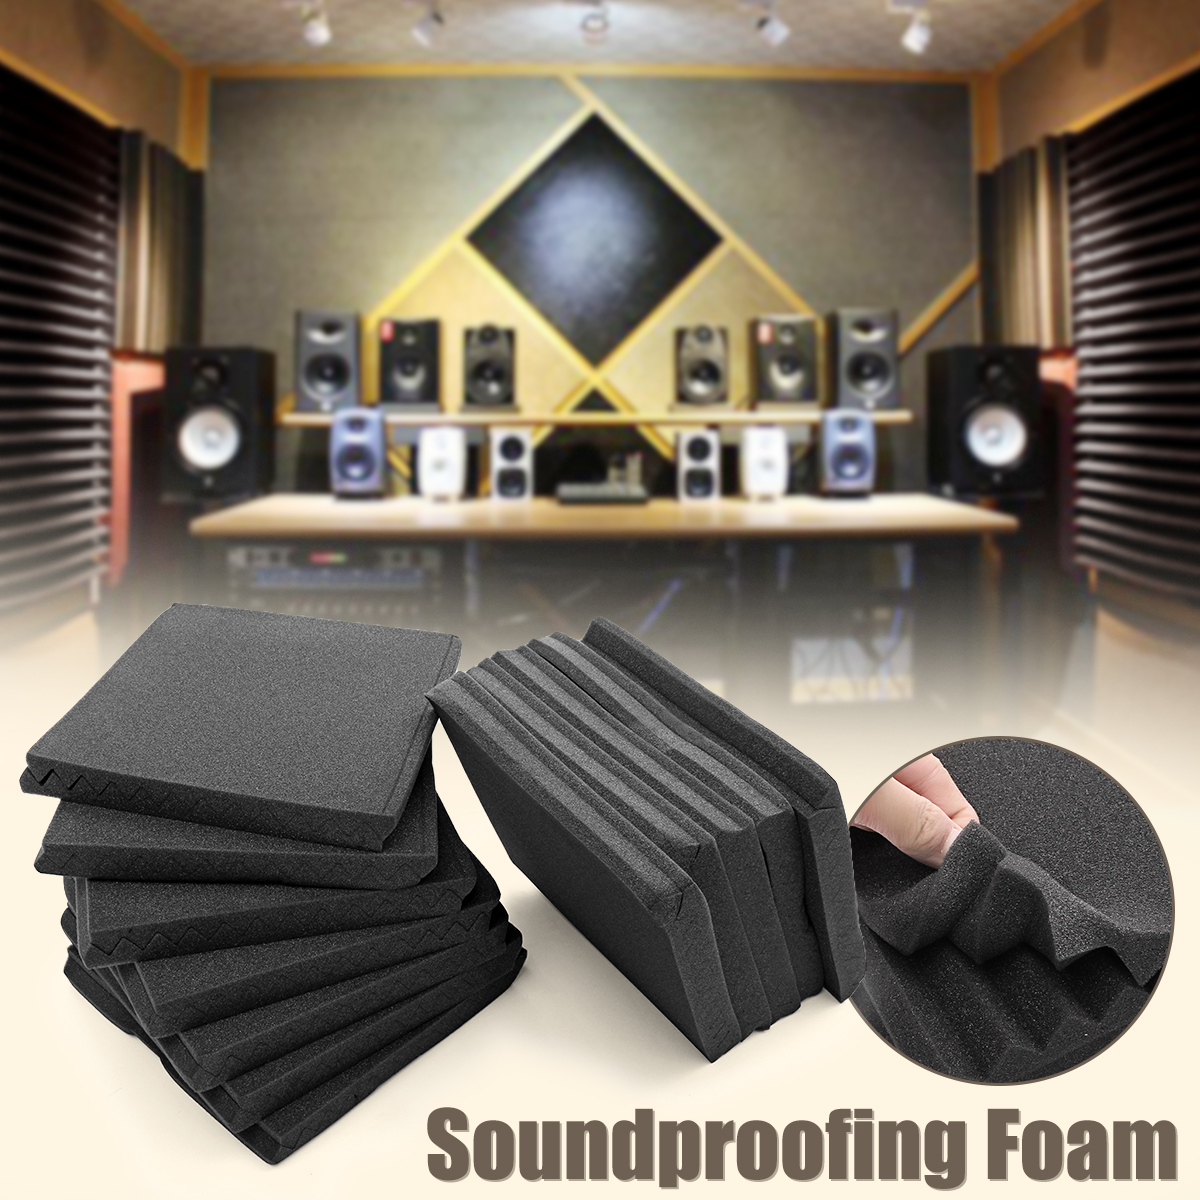 24Pcs 30x30cm Soundproofing Foam Acoustic Foam Sound Treatment Studio Room Noise Absorption Wedge Tiles Polyurethane Foam foam